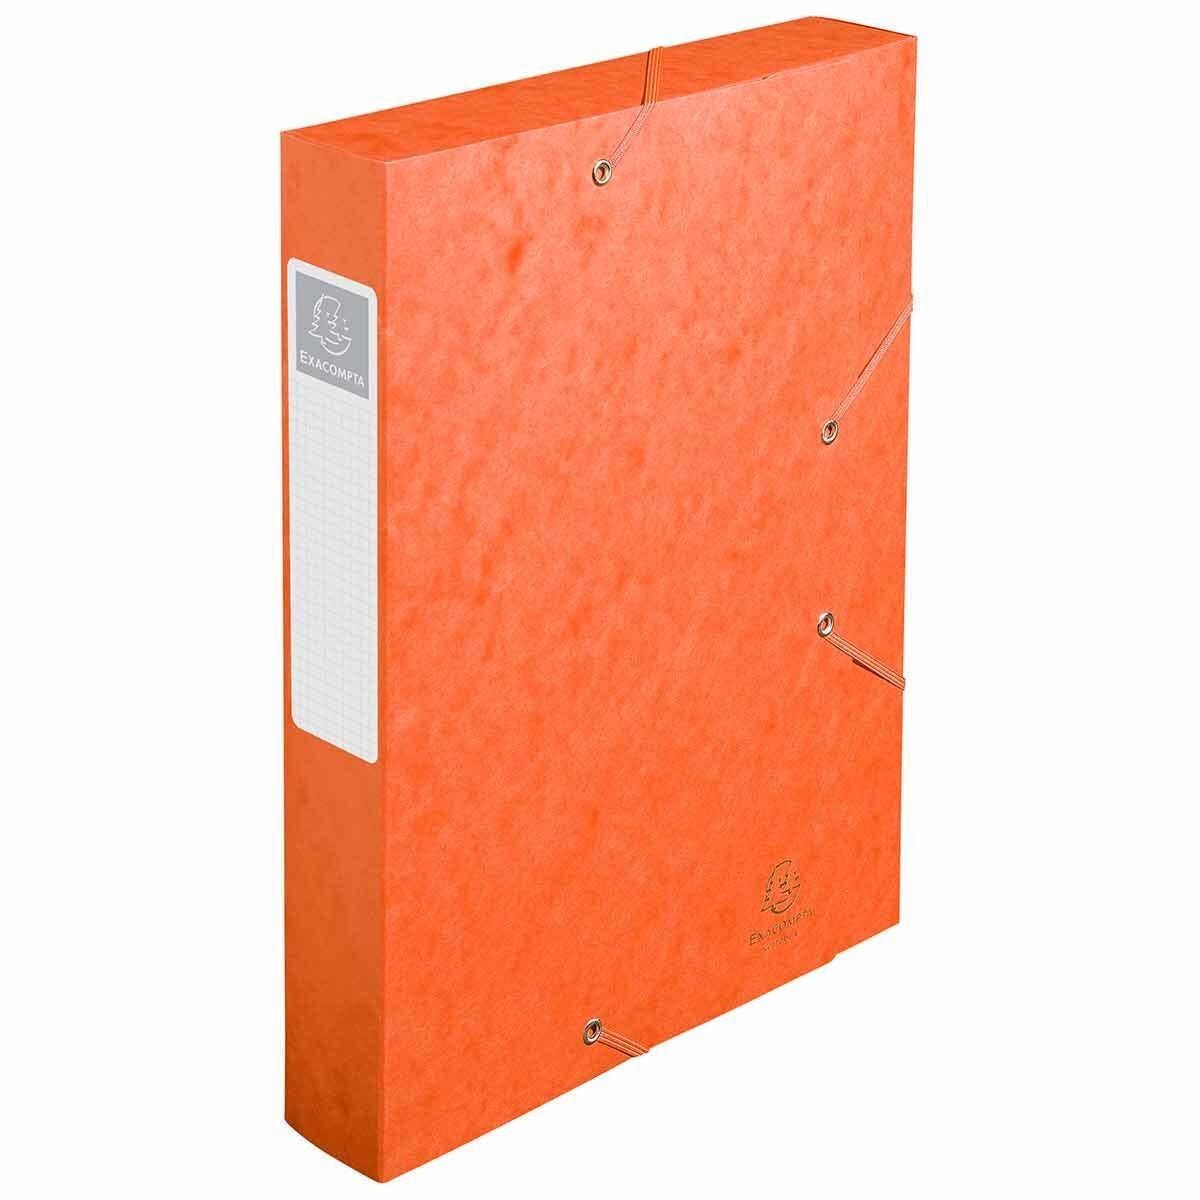 Exacompta Elasticated Box File Pressboard A4 60mm Pack of 10 Orange